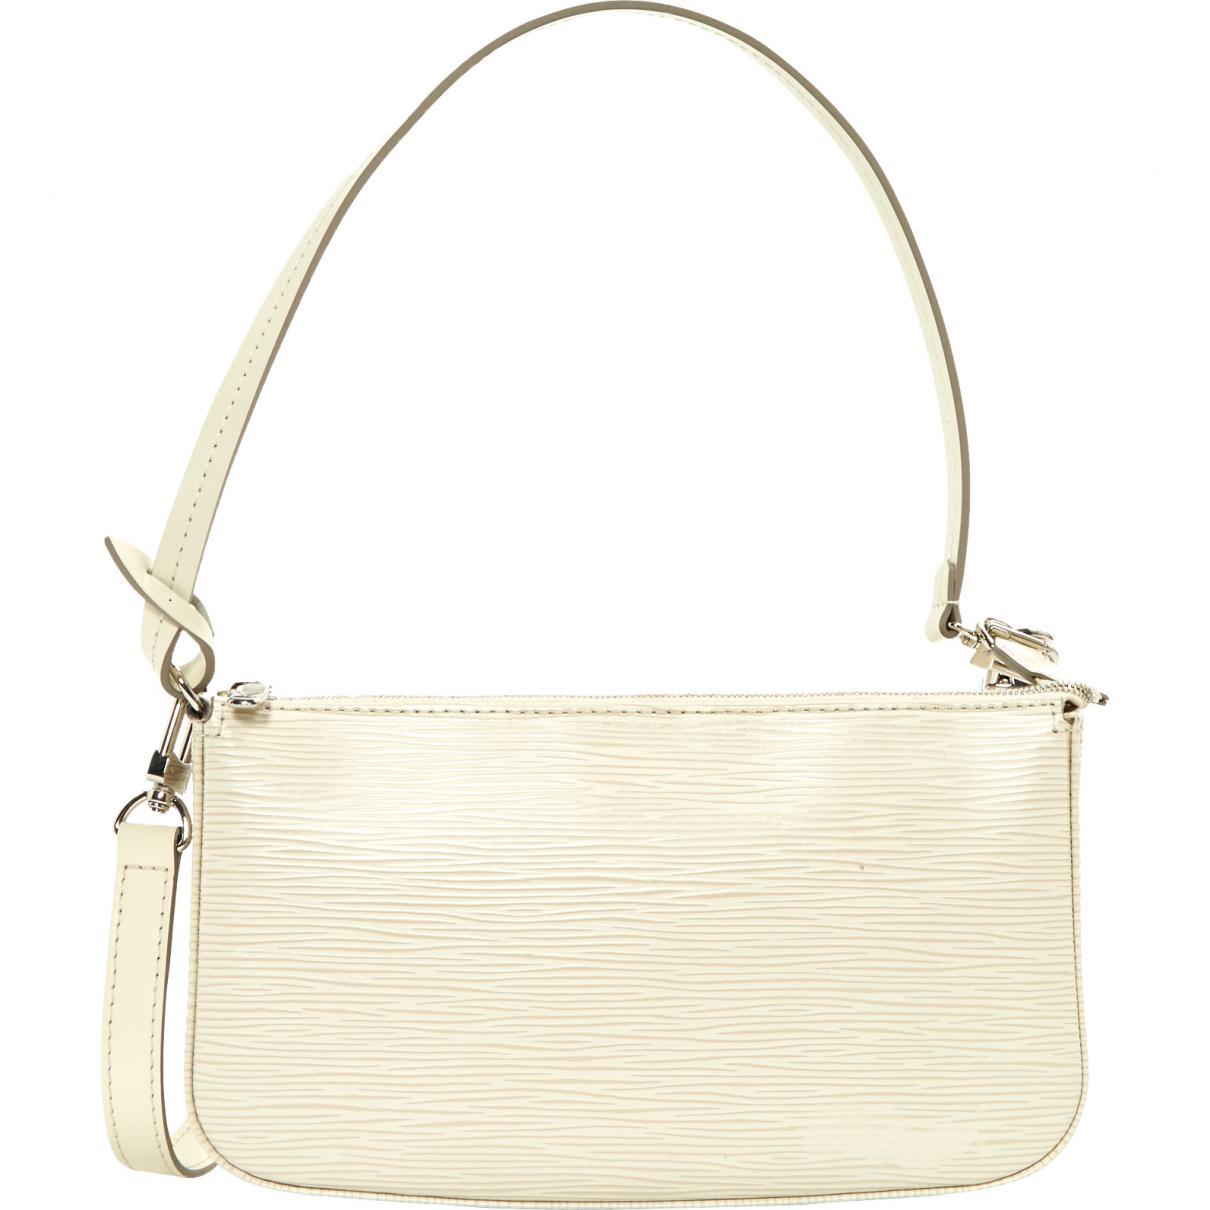 a372e4f43143 Louis Vuitton Preowned Leather mini bag hOcD9qm51 ...